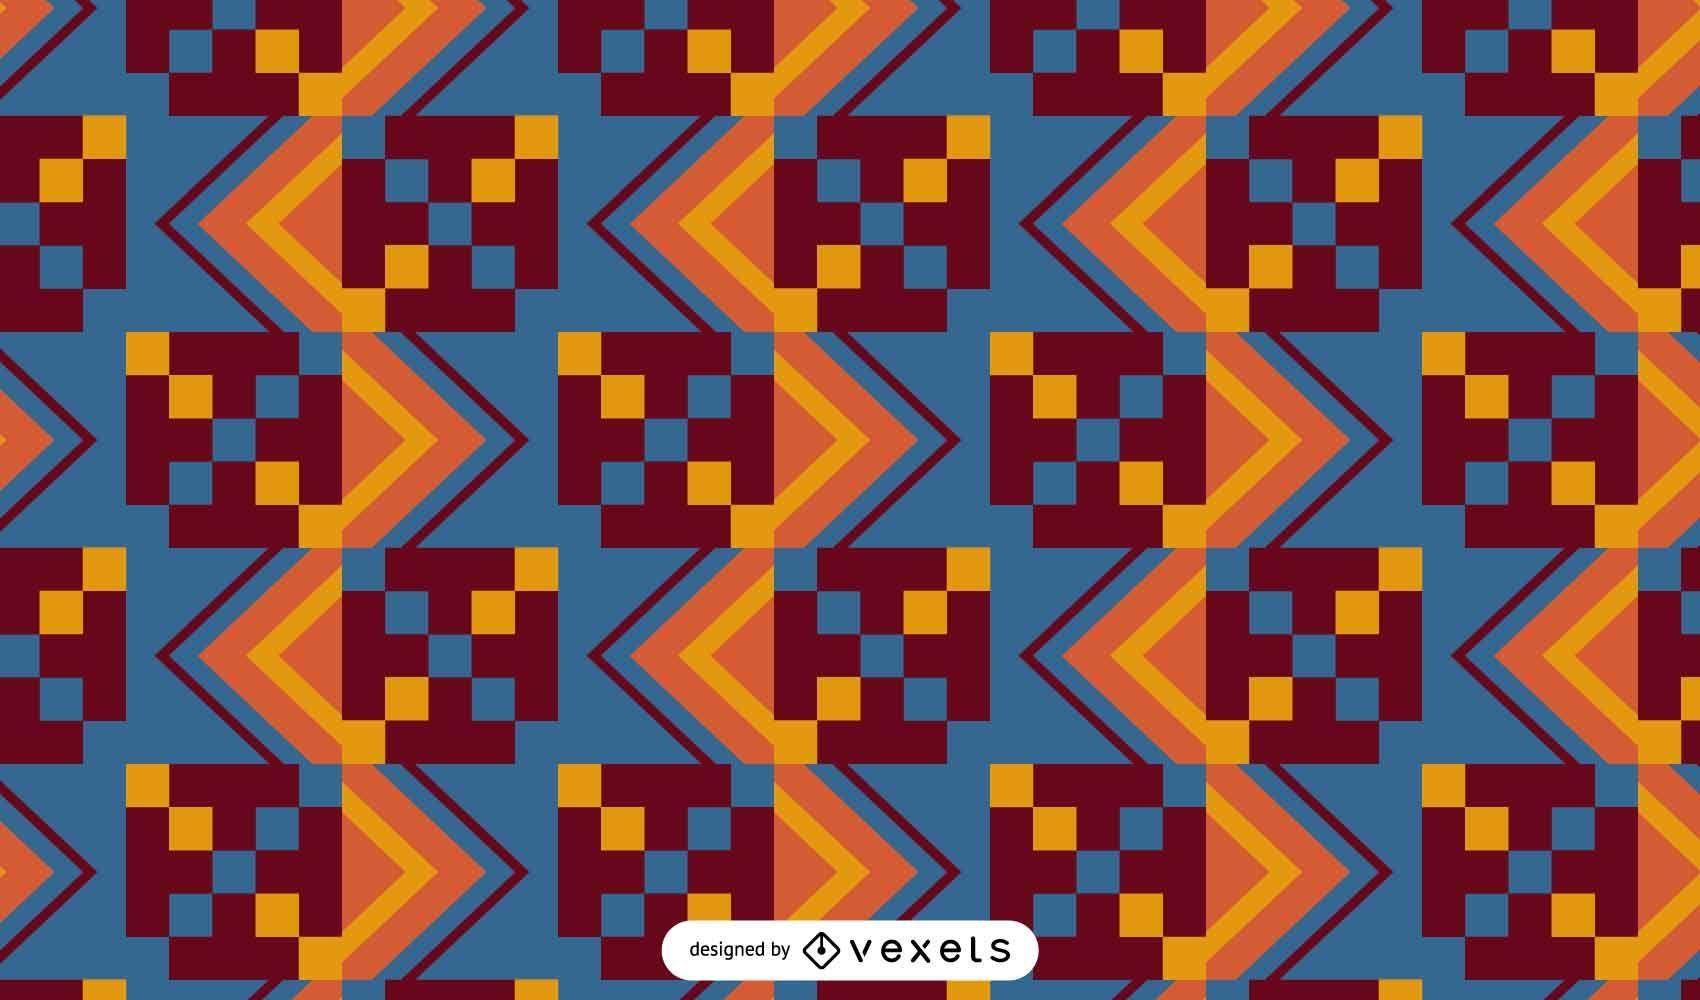 Kente cloth pattern design